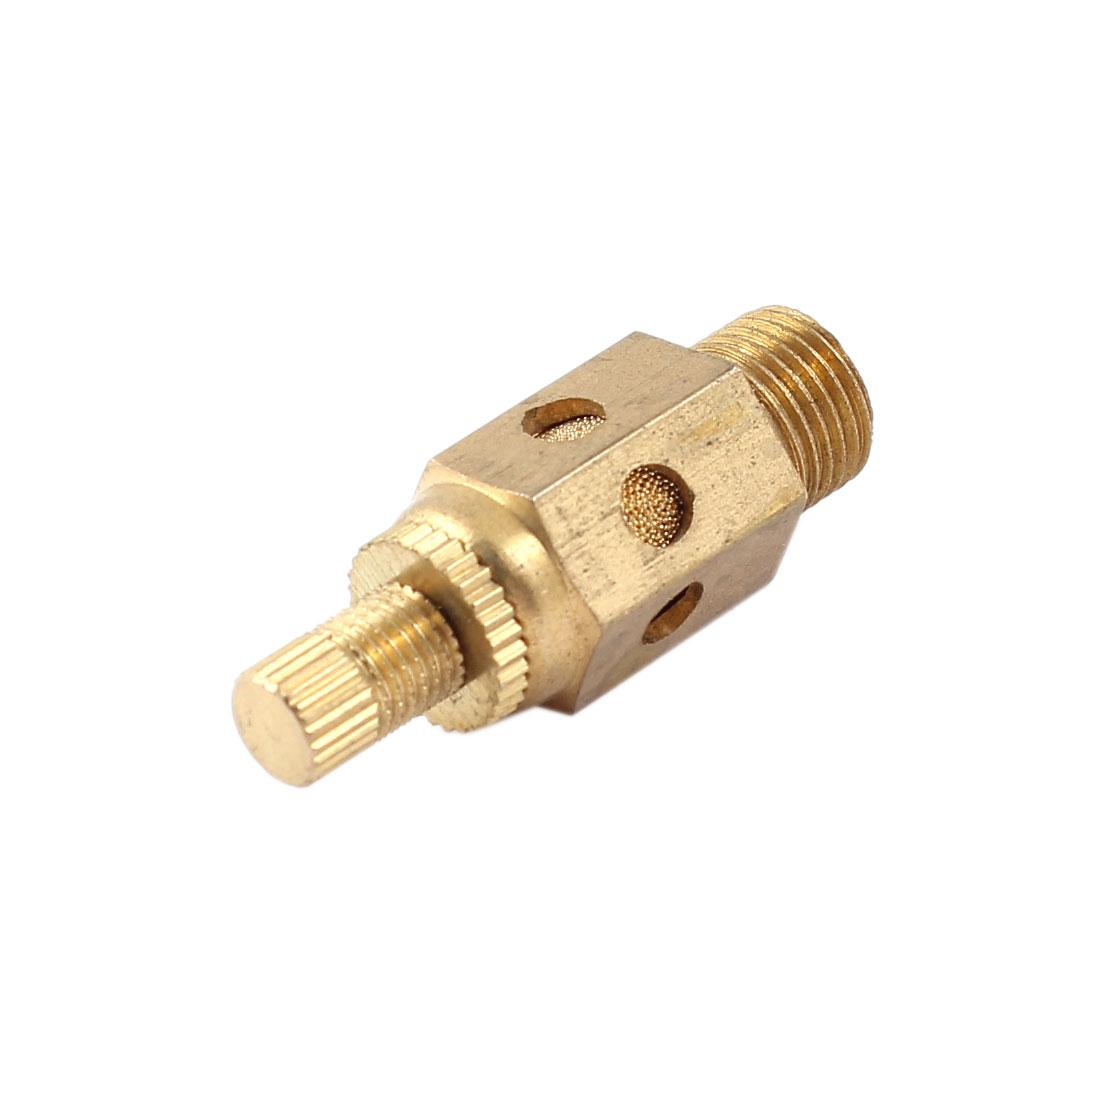 Air Pneumatic 9.5mm Male Thread Reduce Noise Exhaust Silencer Muffler